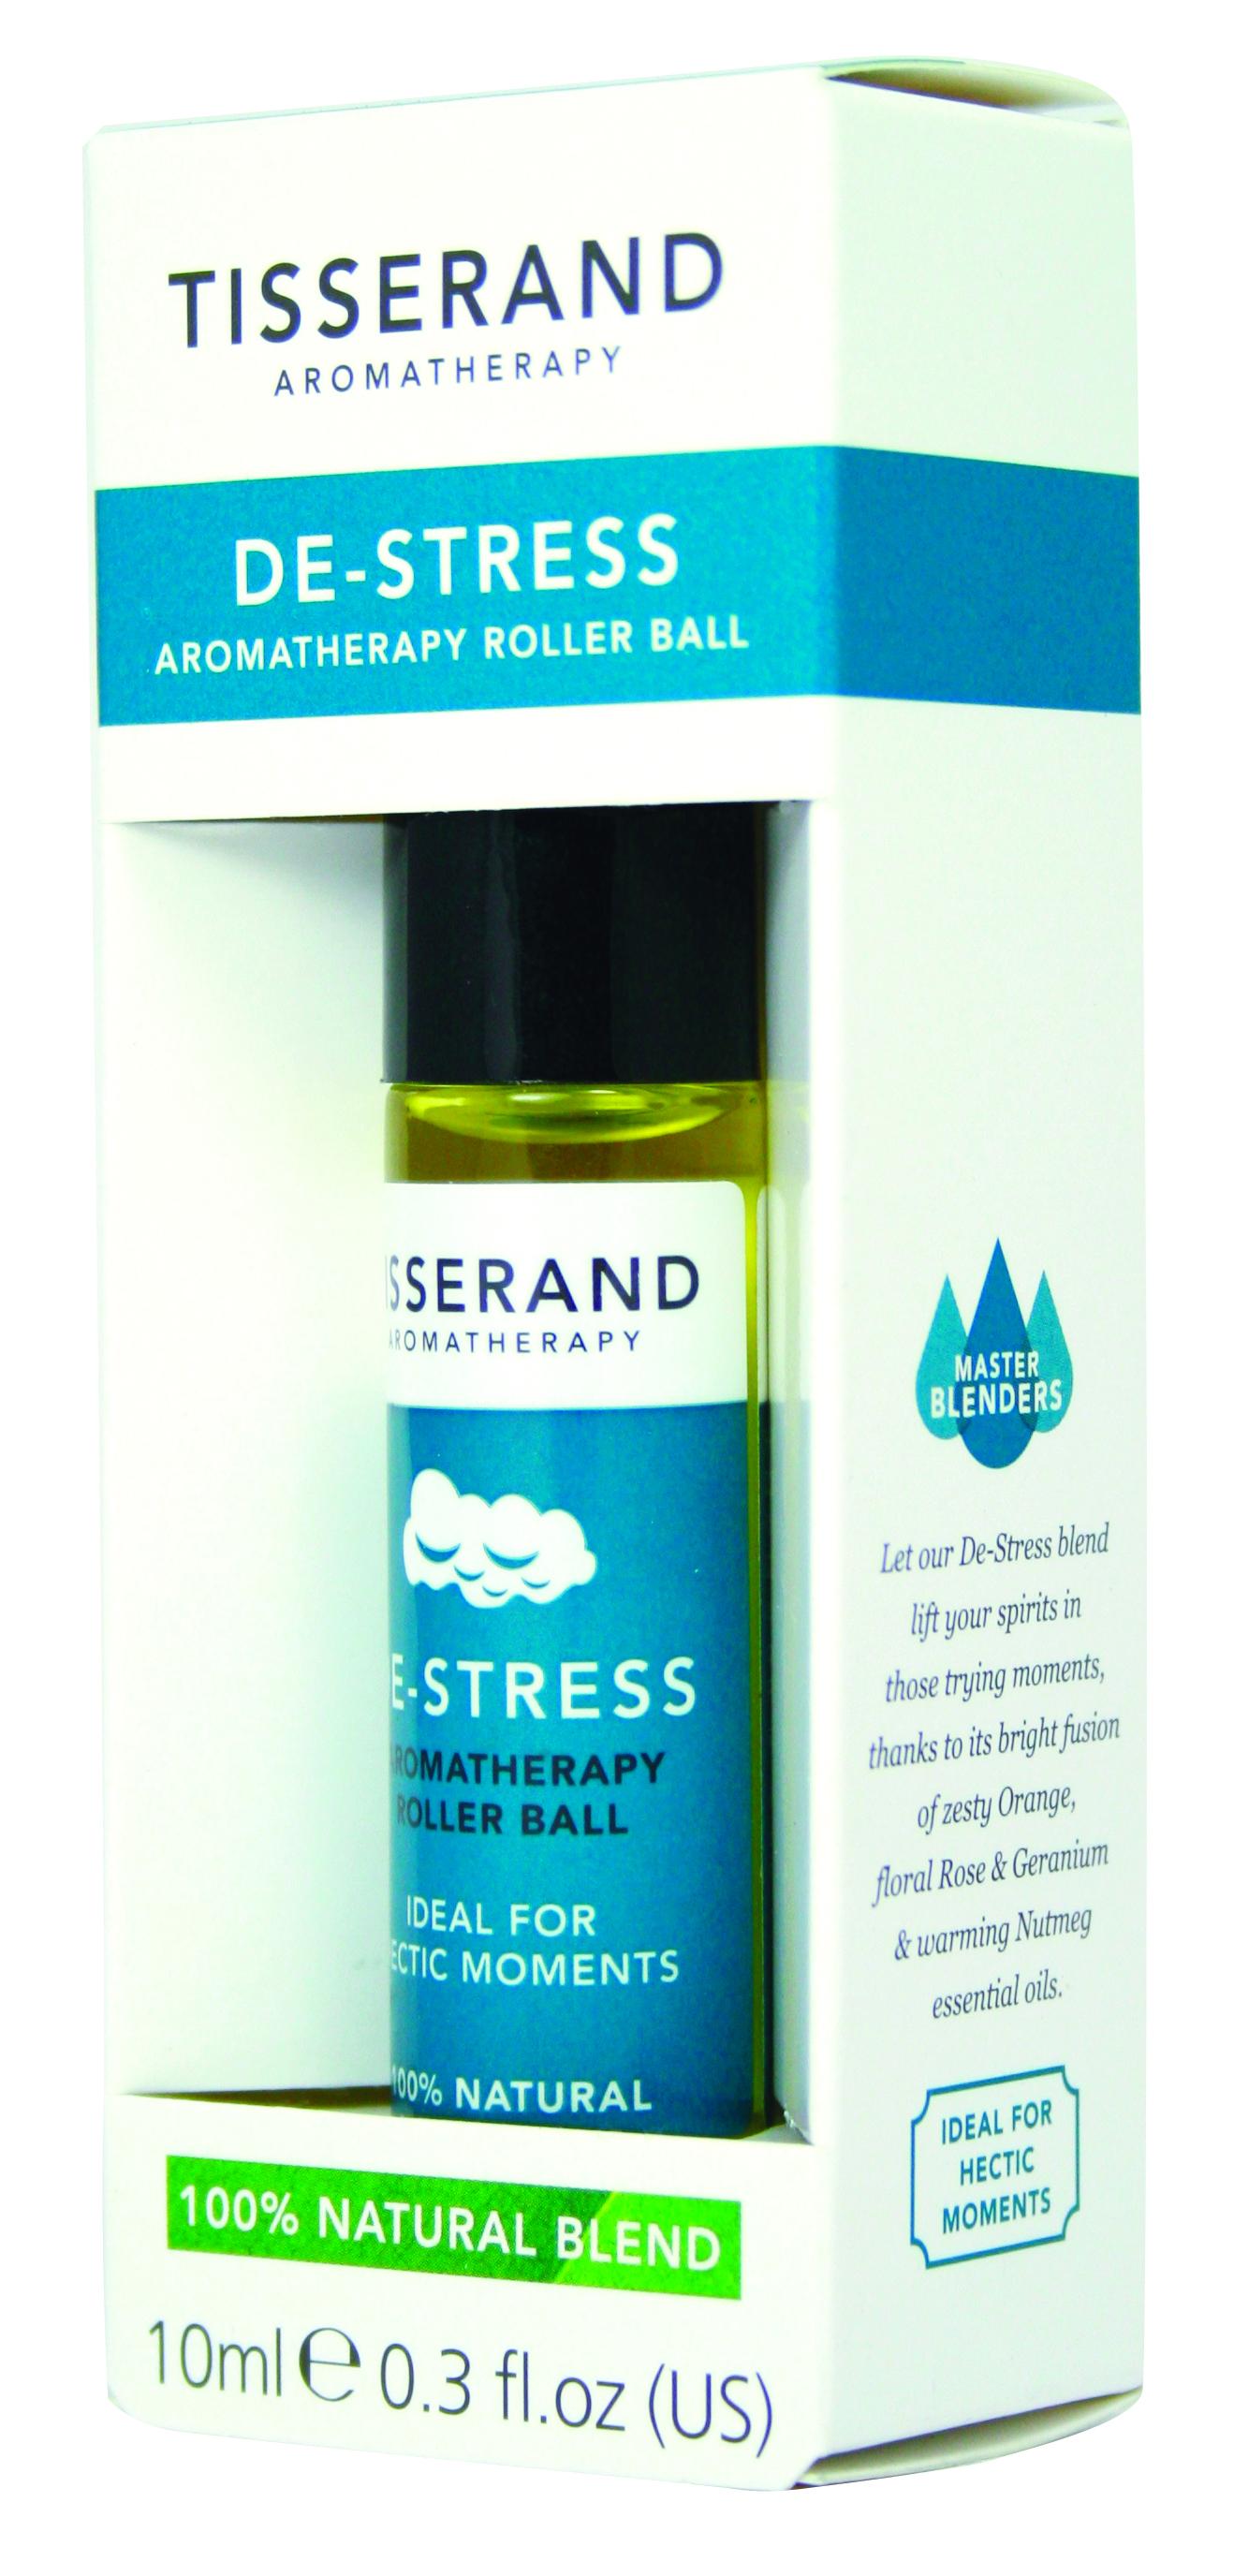 Tisserand De-Stress Aromatherapy Roller Ball